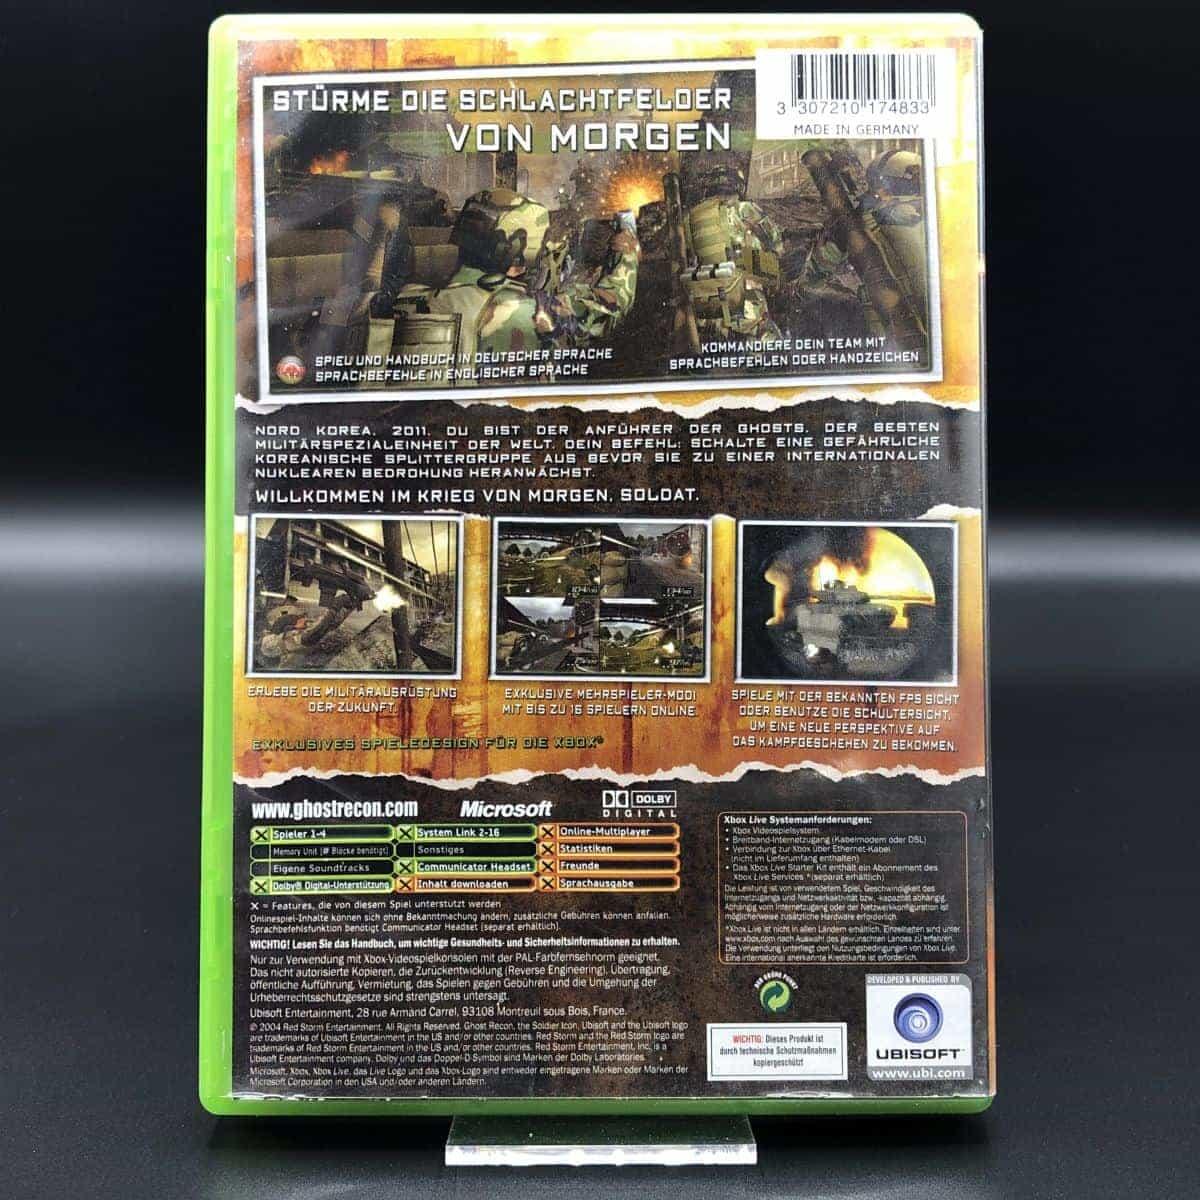 XBC Tom Clancy's Ghost Recon 2 (Komplett) (Gebrauchsspuren) Microsoft Xbox Classic